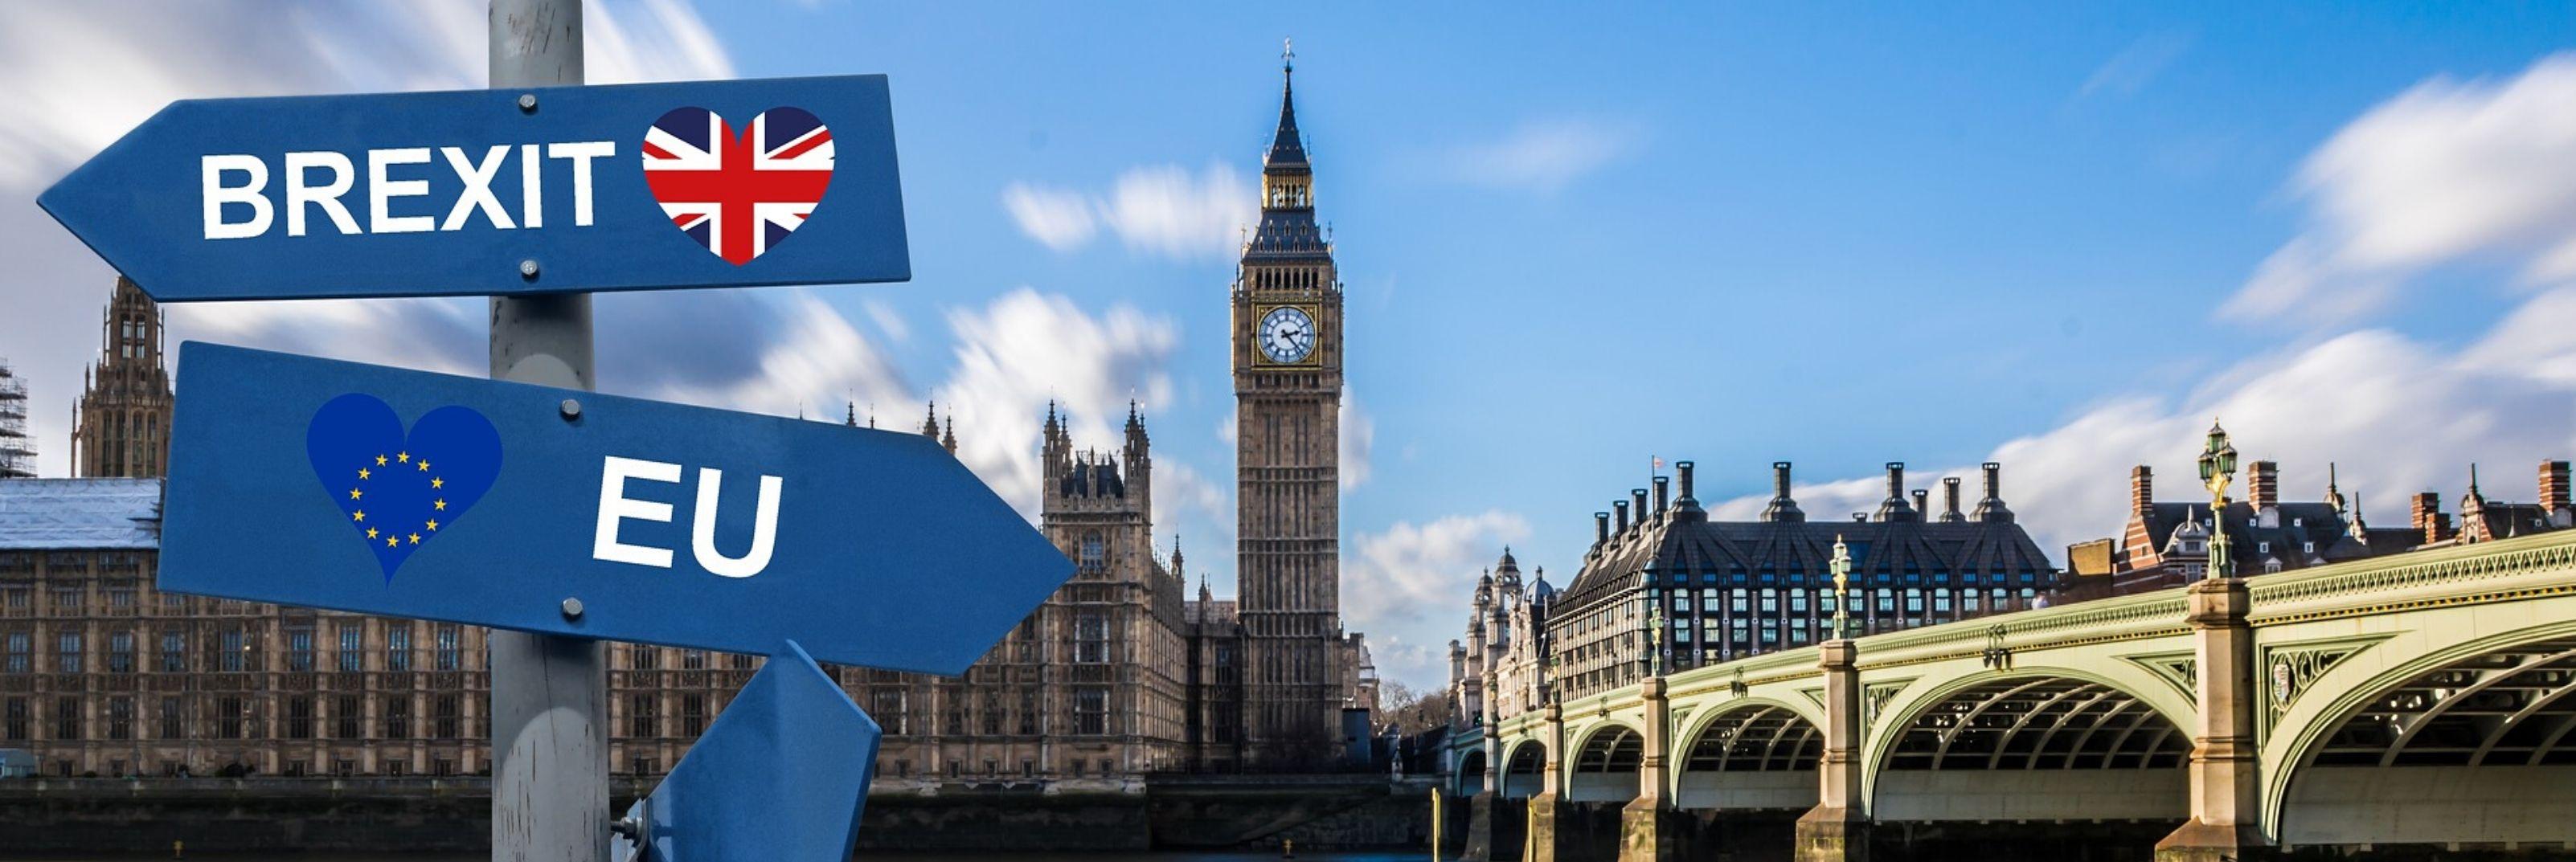 2020-01-Mondo-Privacy-Brexit-GDPR-Privacy